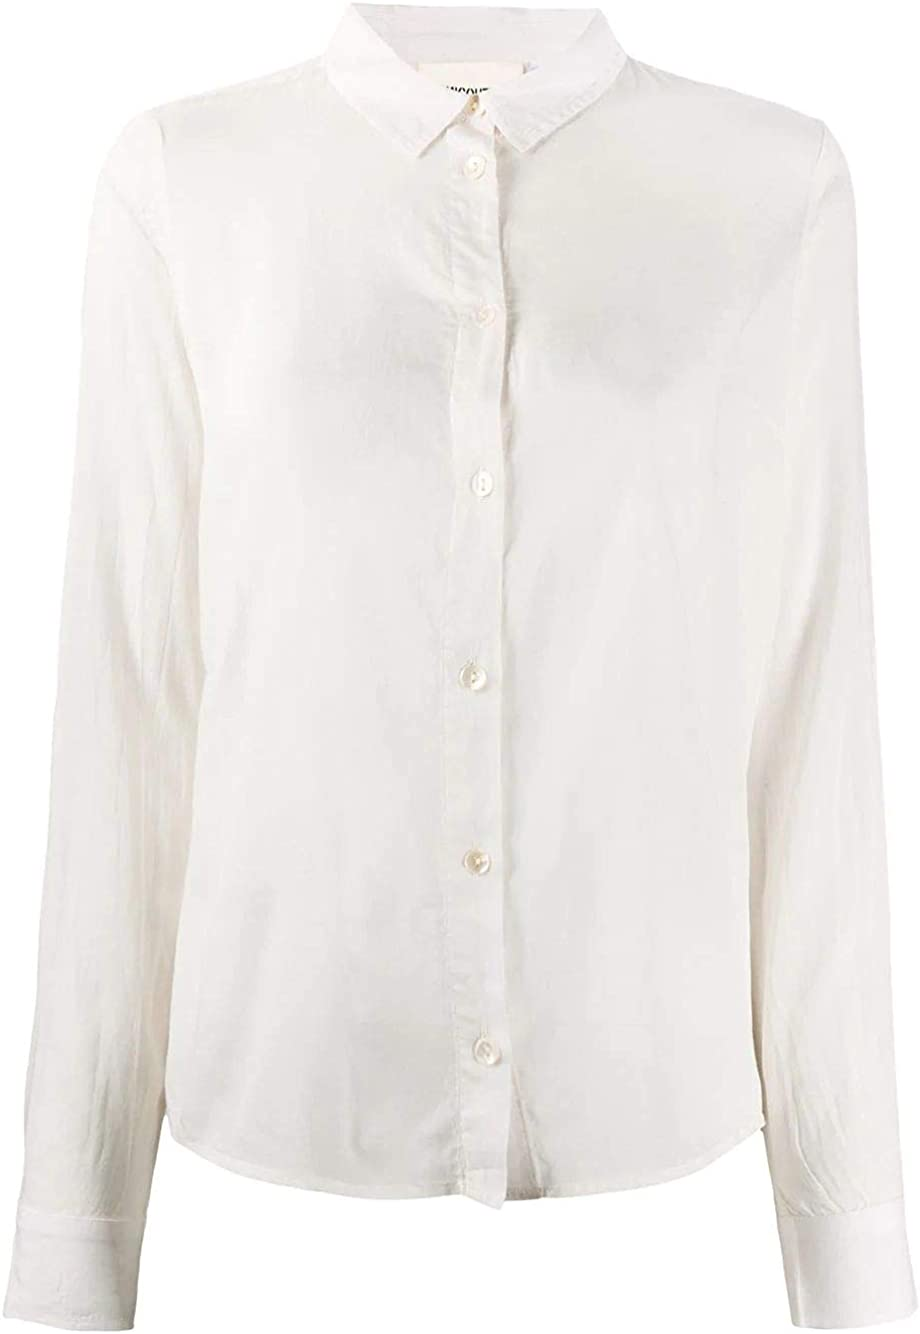 Semi-Couture Y0SI06A400 - Camiseta de Manga Corta para Mujer ...